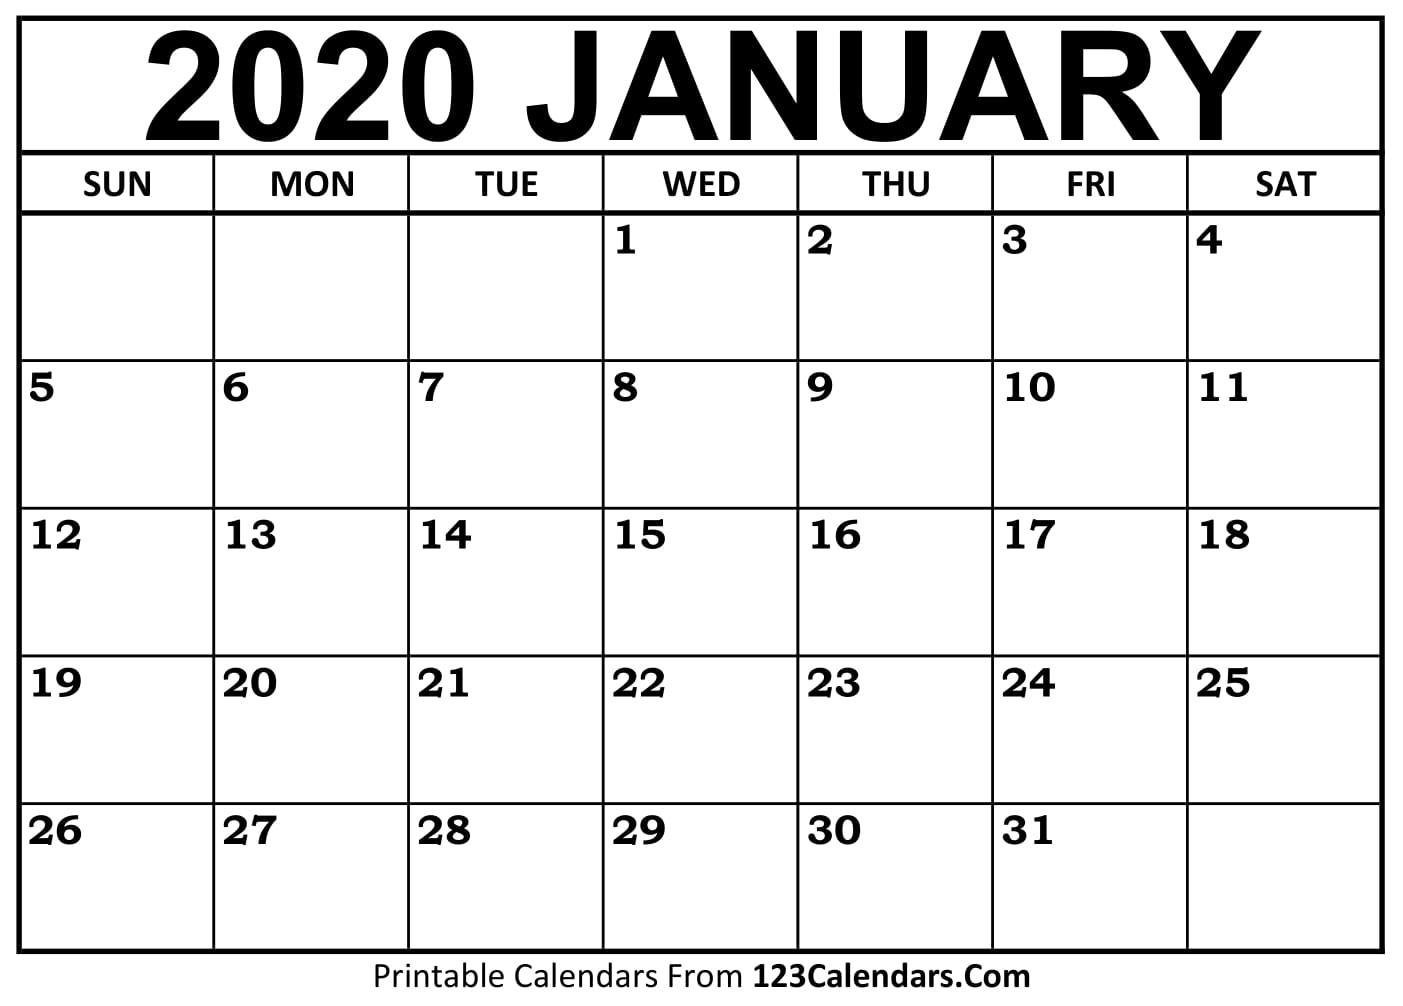 Free Printable Calendar   123Calendars